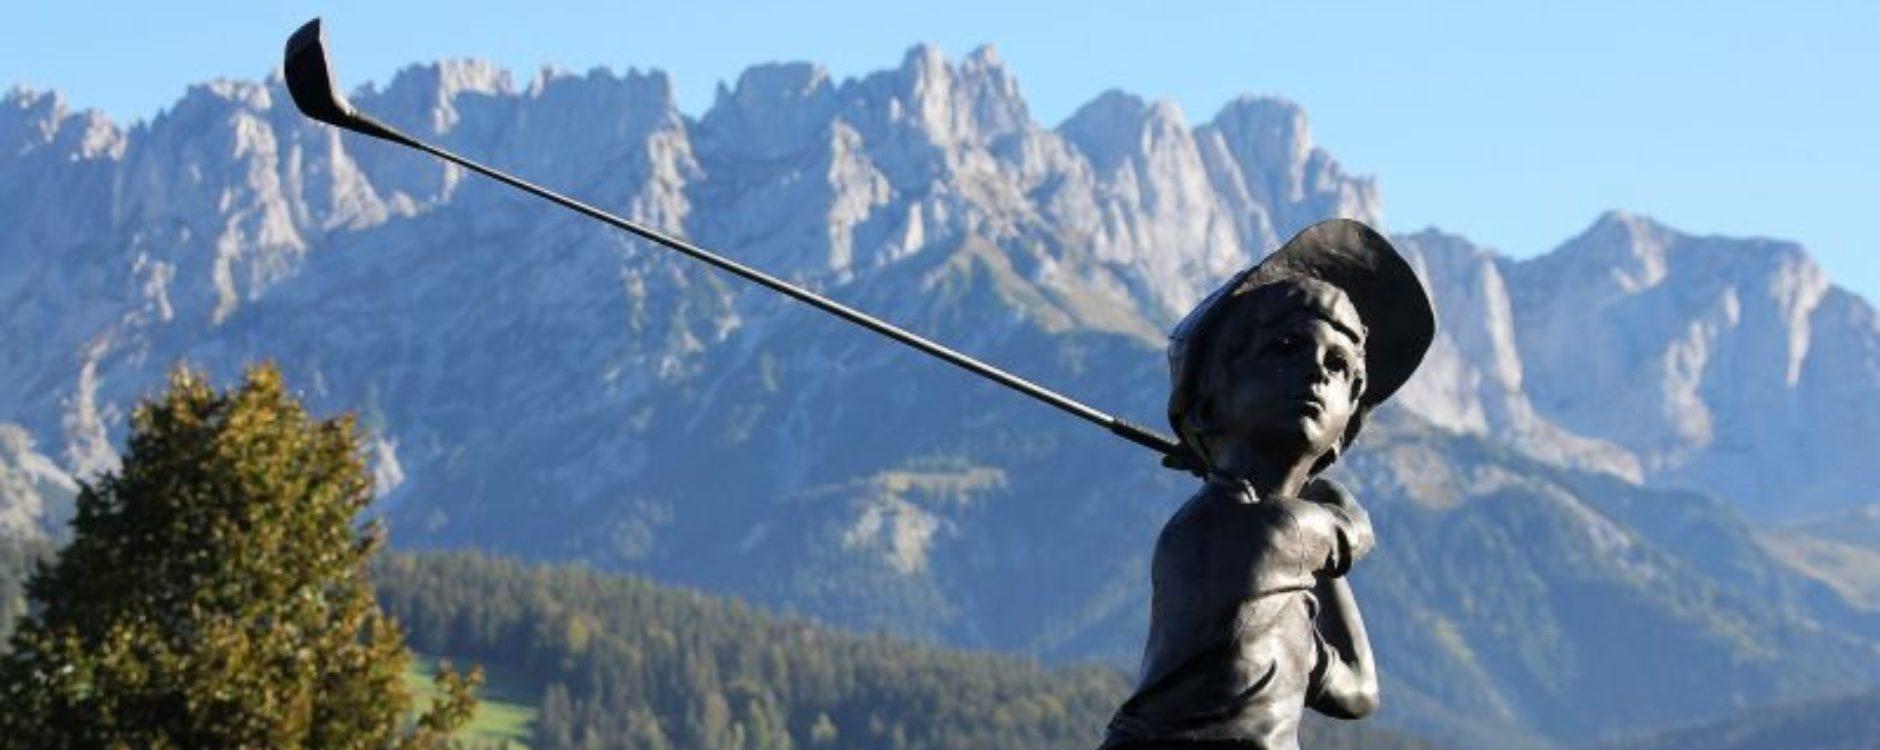 Der Alpengolfer